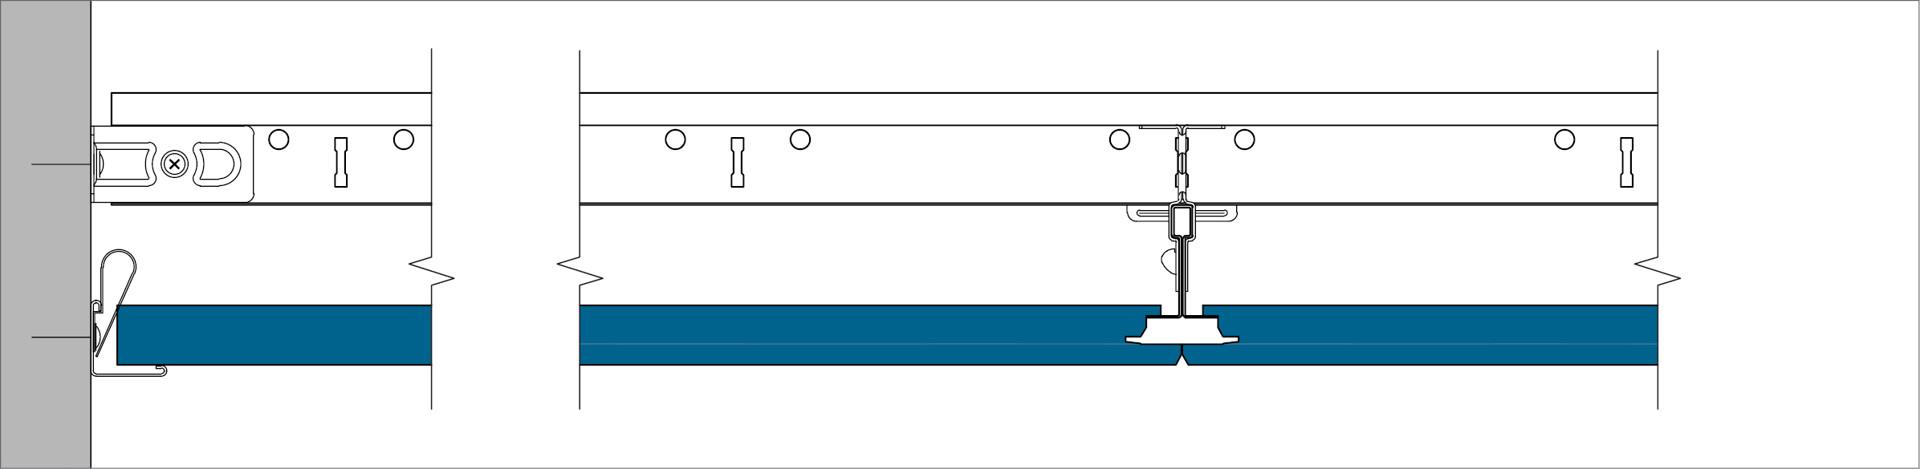 X DLC - Perimeter finish with wall angle trim